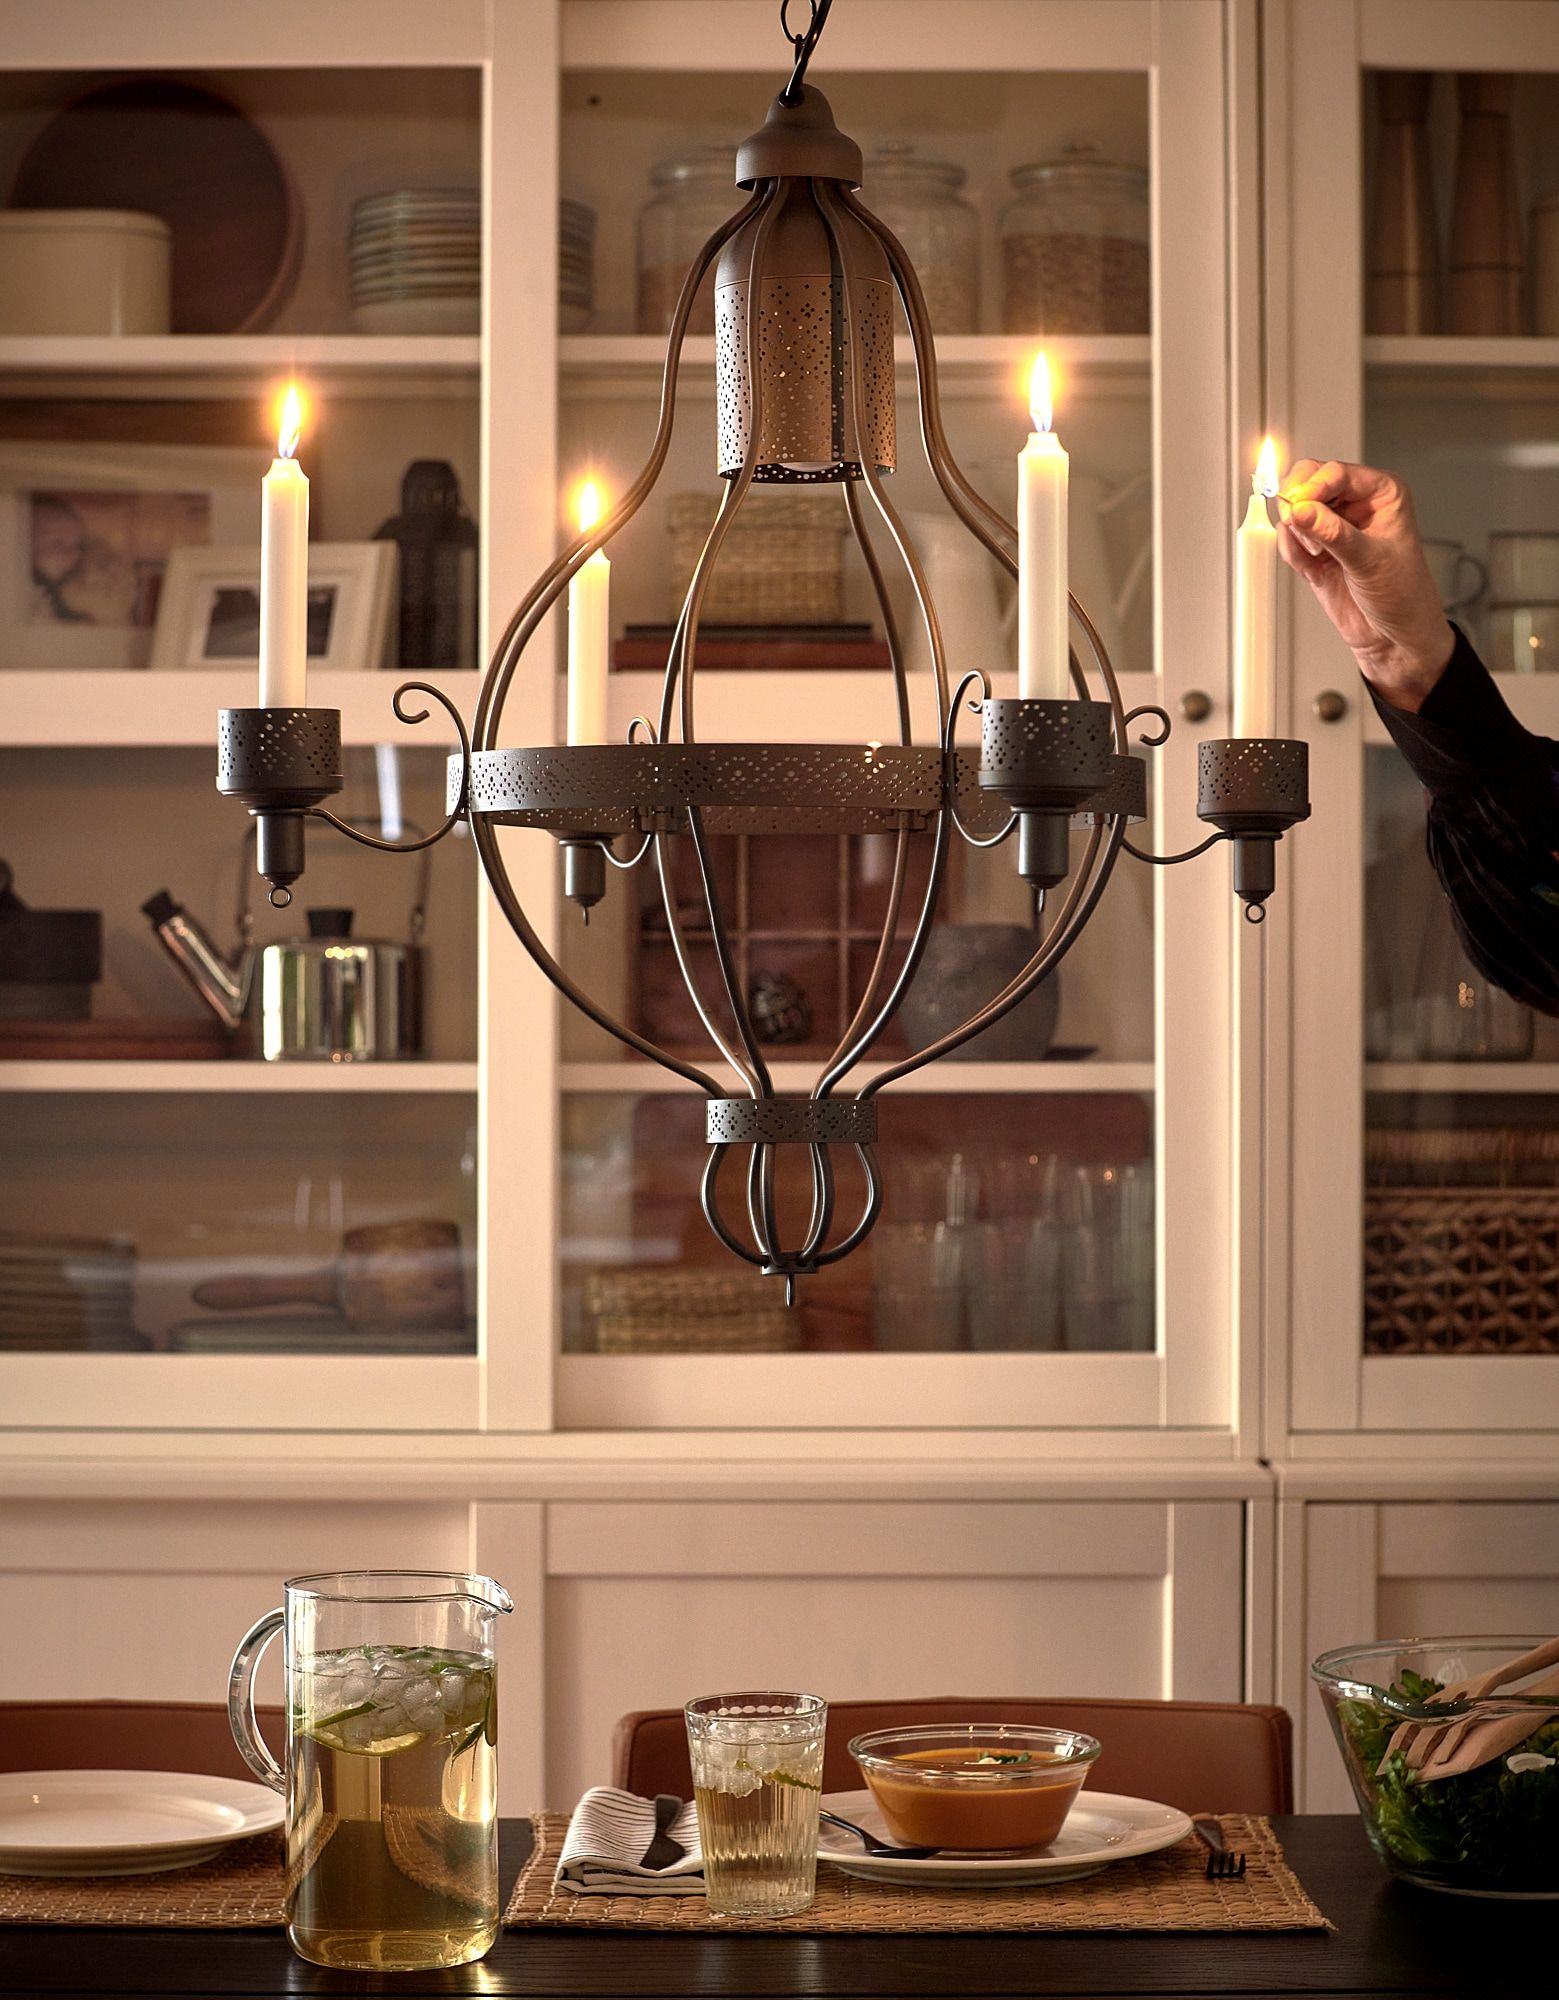 Appelviken Ljuskrona 4 Armad Ikea In 2020 Table Pendant Light Ikea Candles Fall Dining Room Table